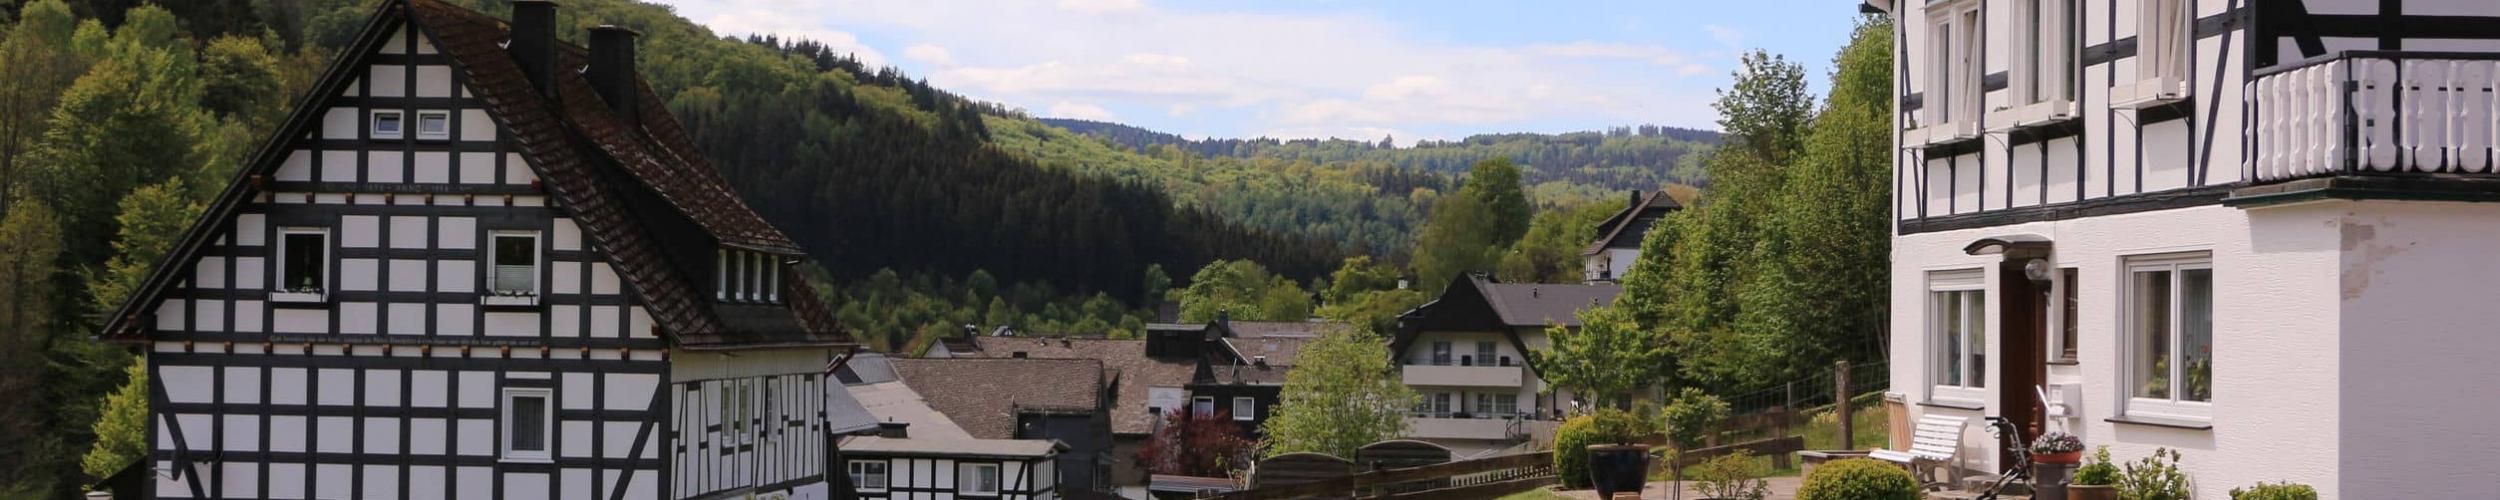 Motortrip Sauerland - Land van 1000 bergen | Motorreizen Duitsland